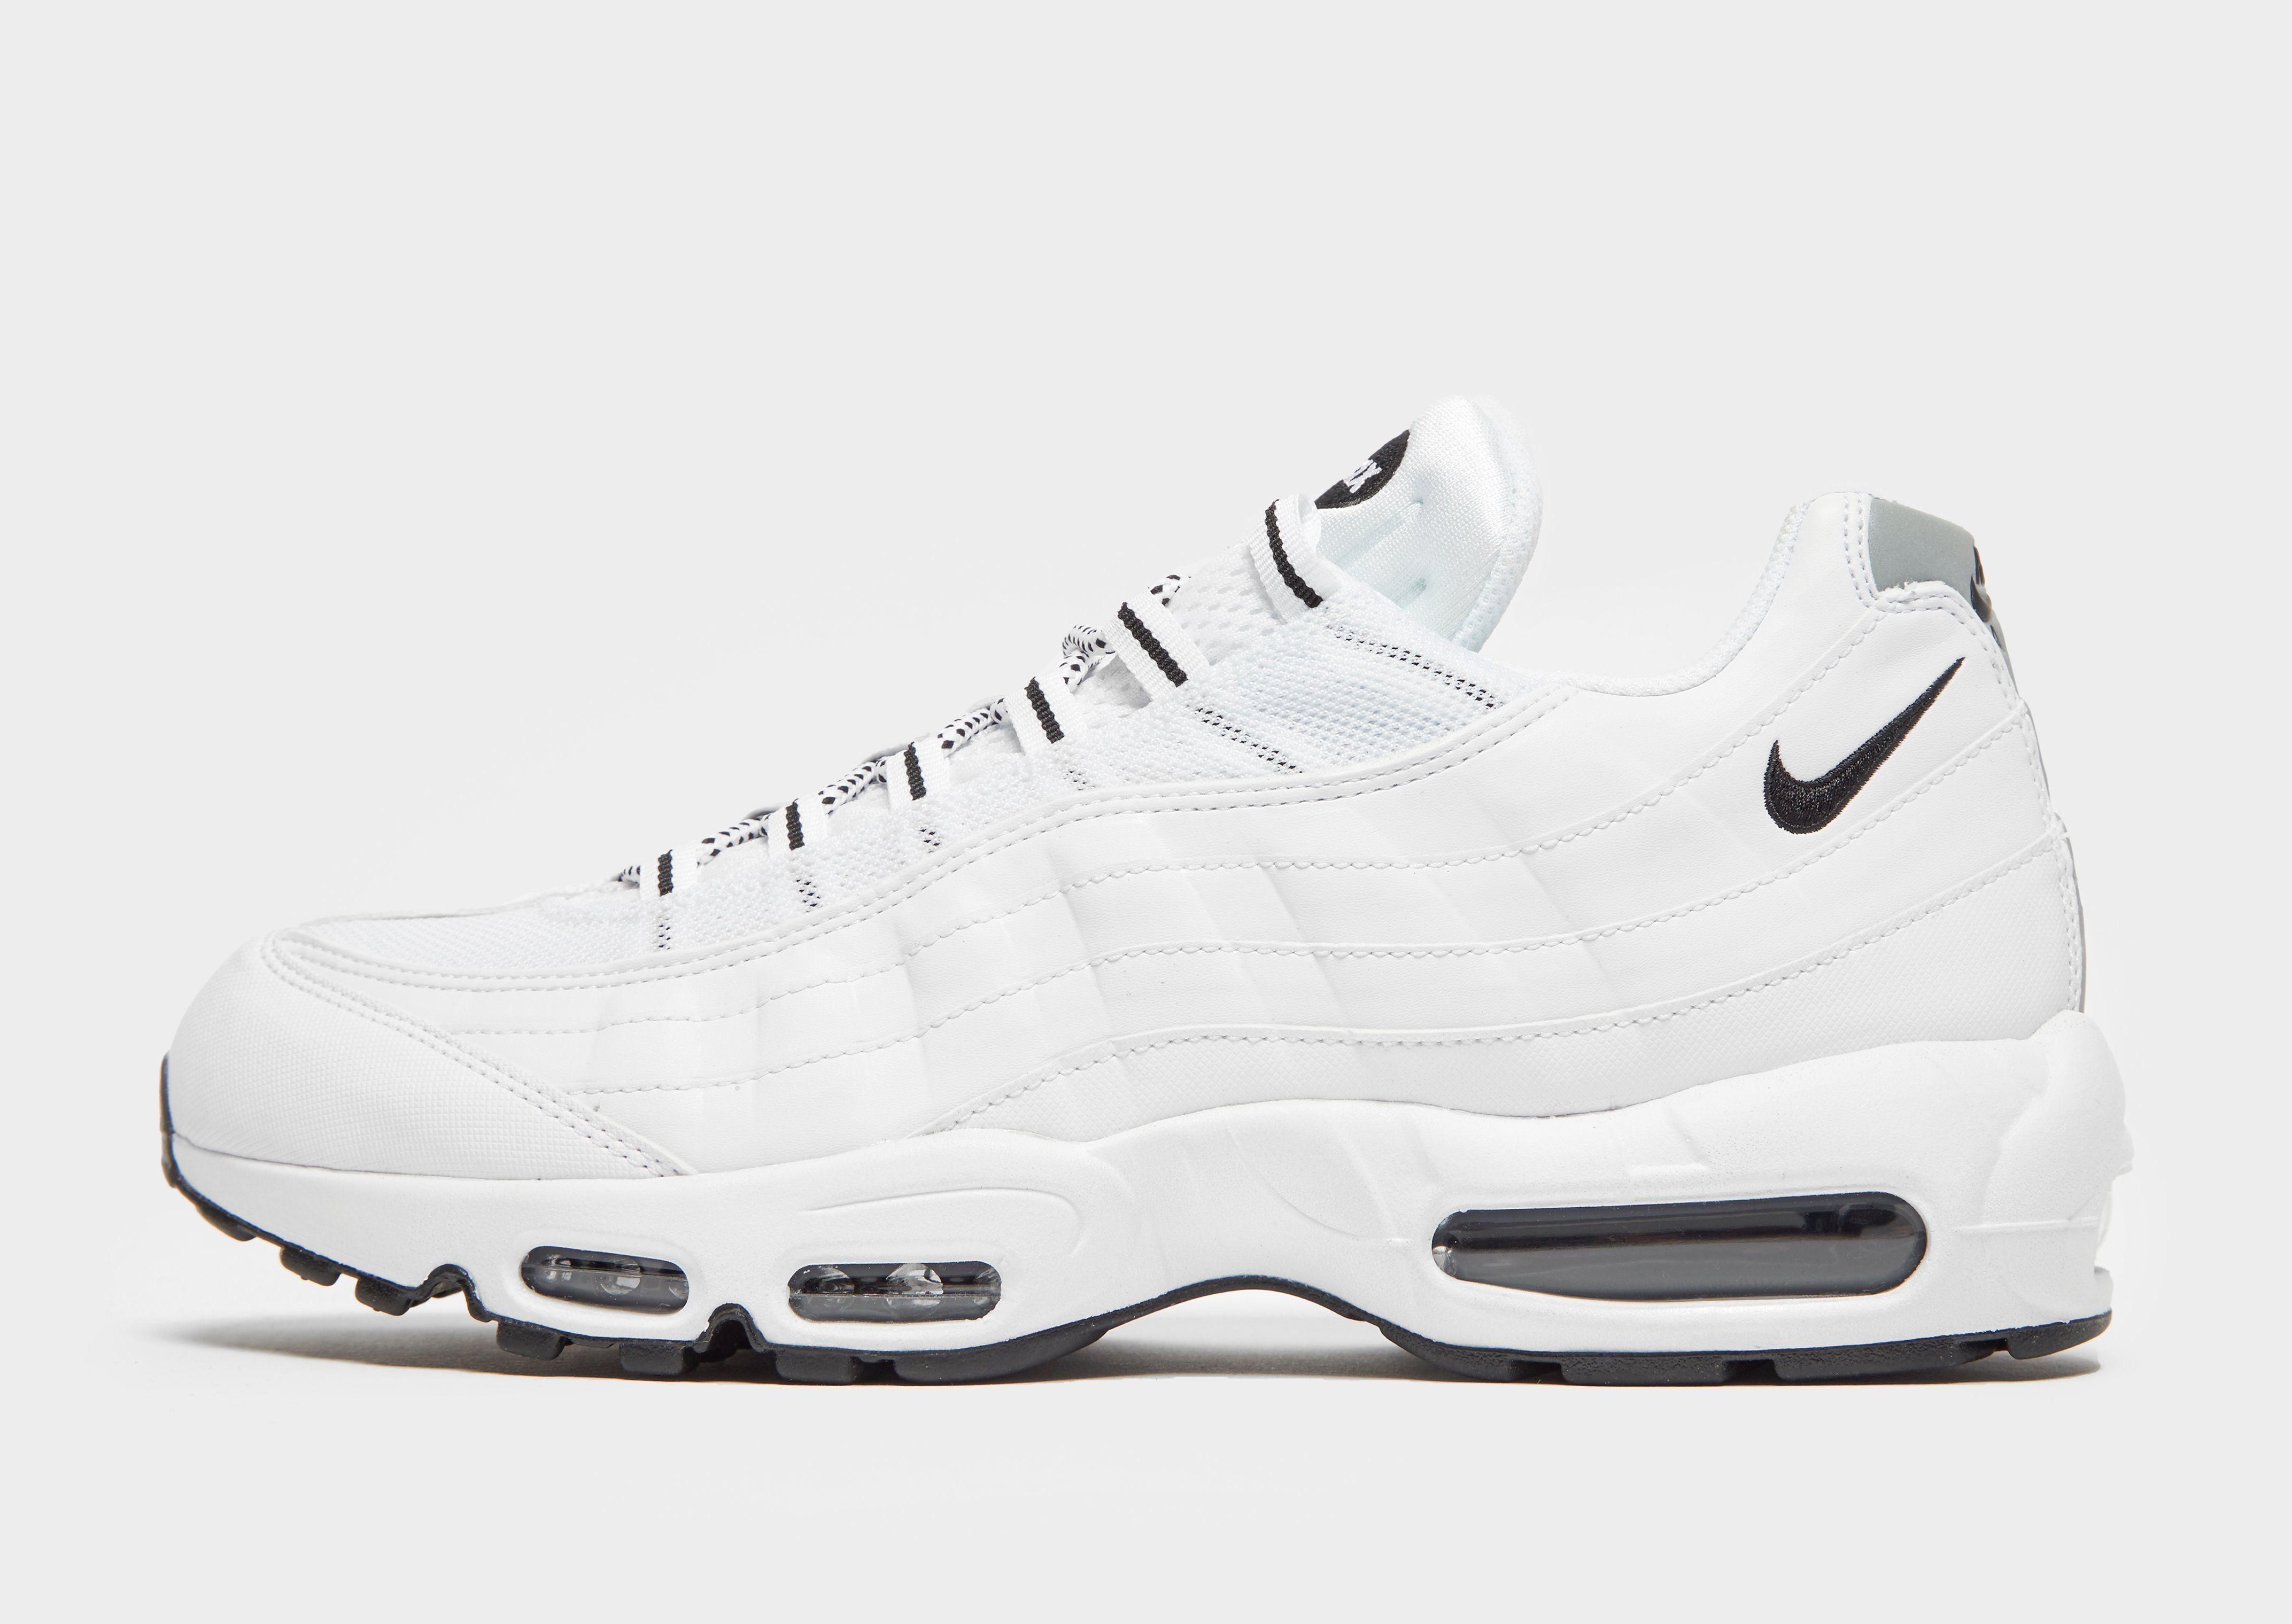 Nike Air Max 95 in 2020 | Nike air max white, White nike